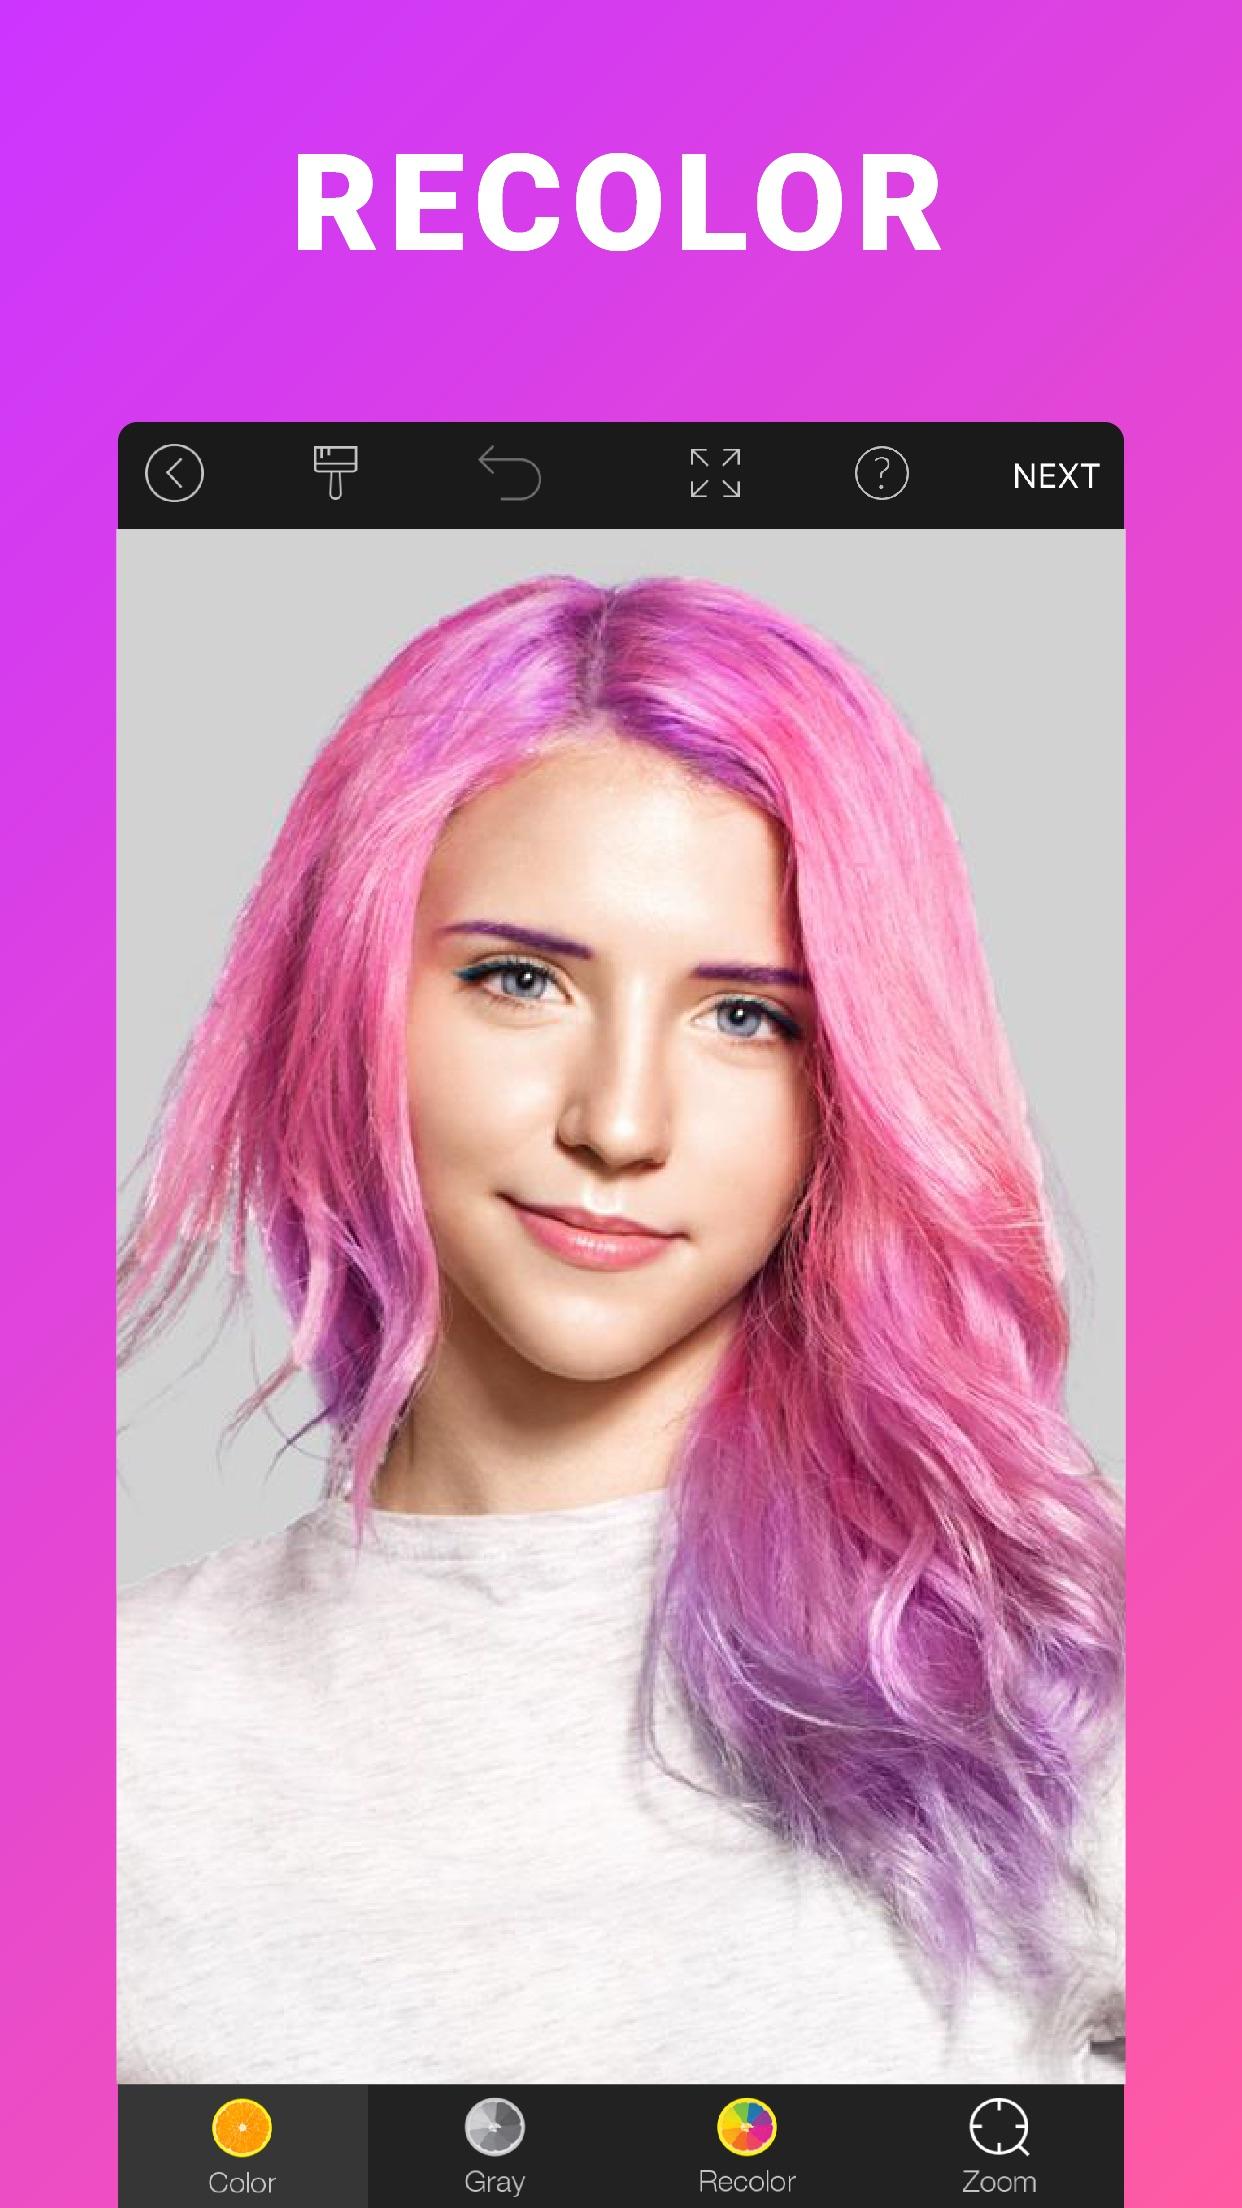 Color Pop Effects Photo Editor Screenshot